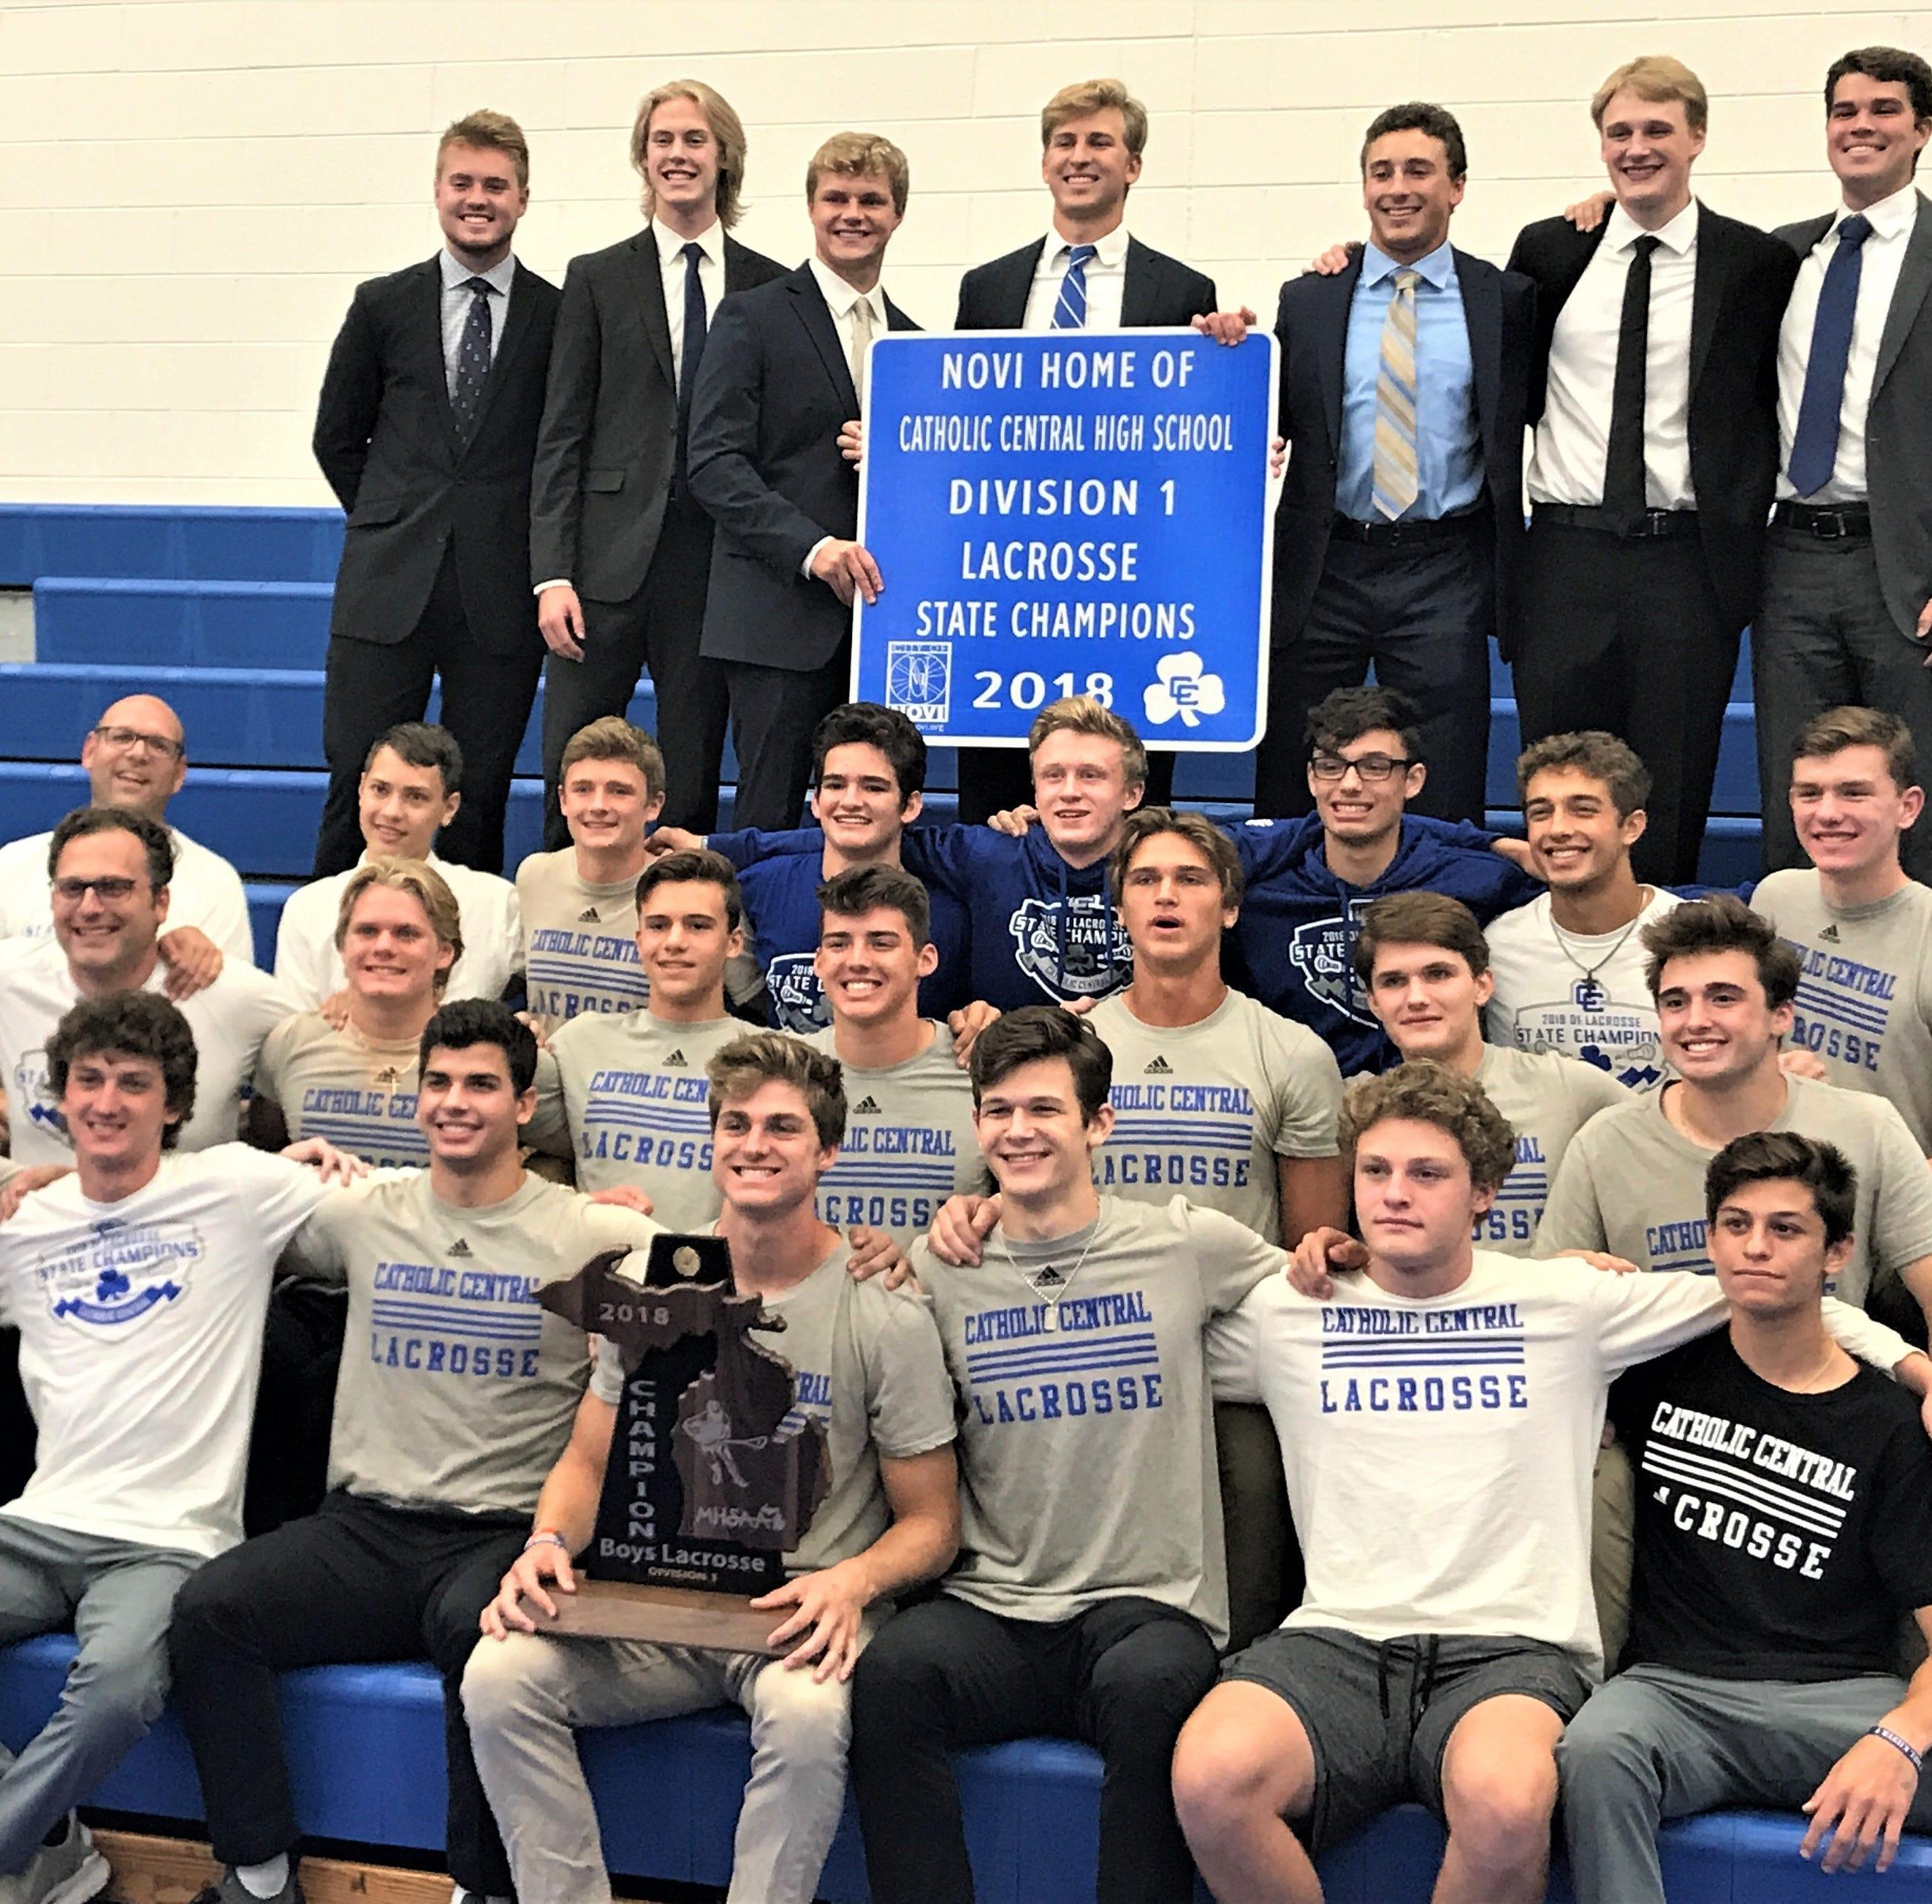 Detroit CC raises first state championship lacrosse banner